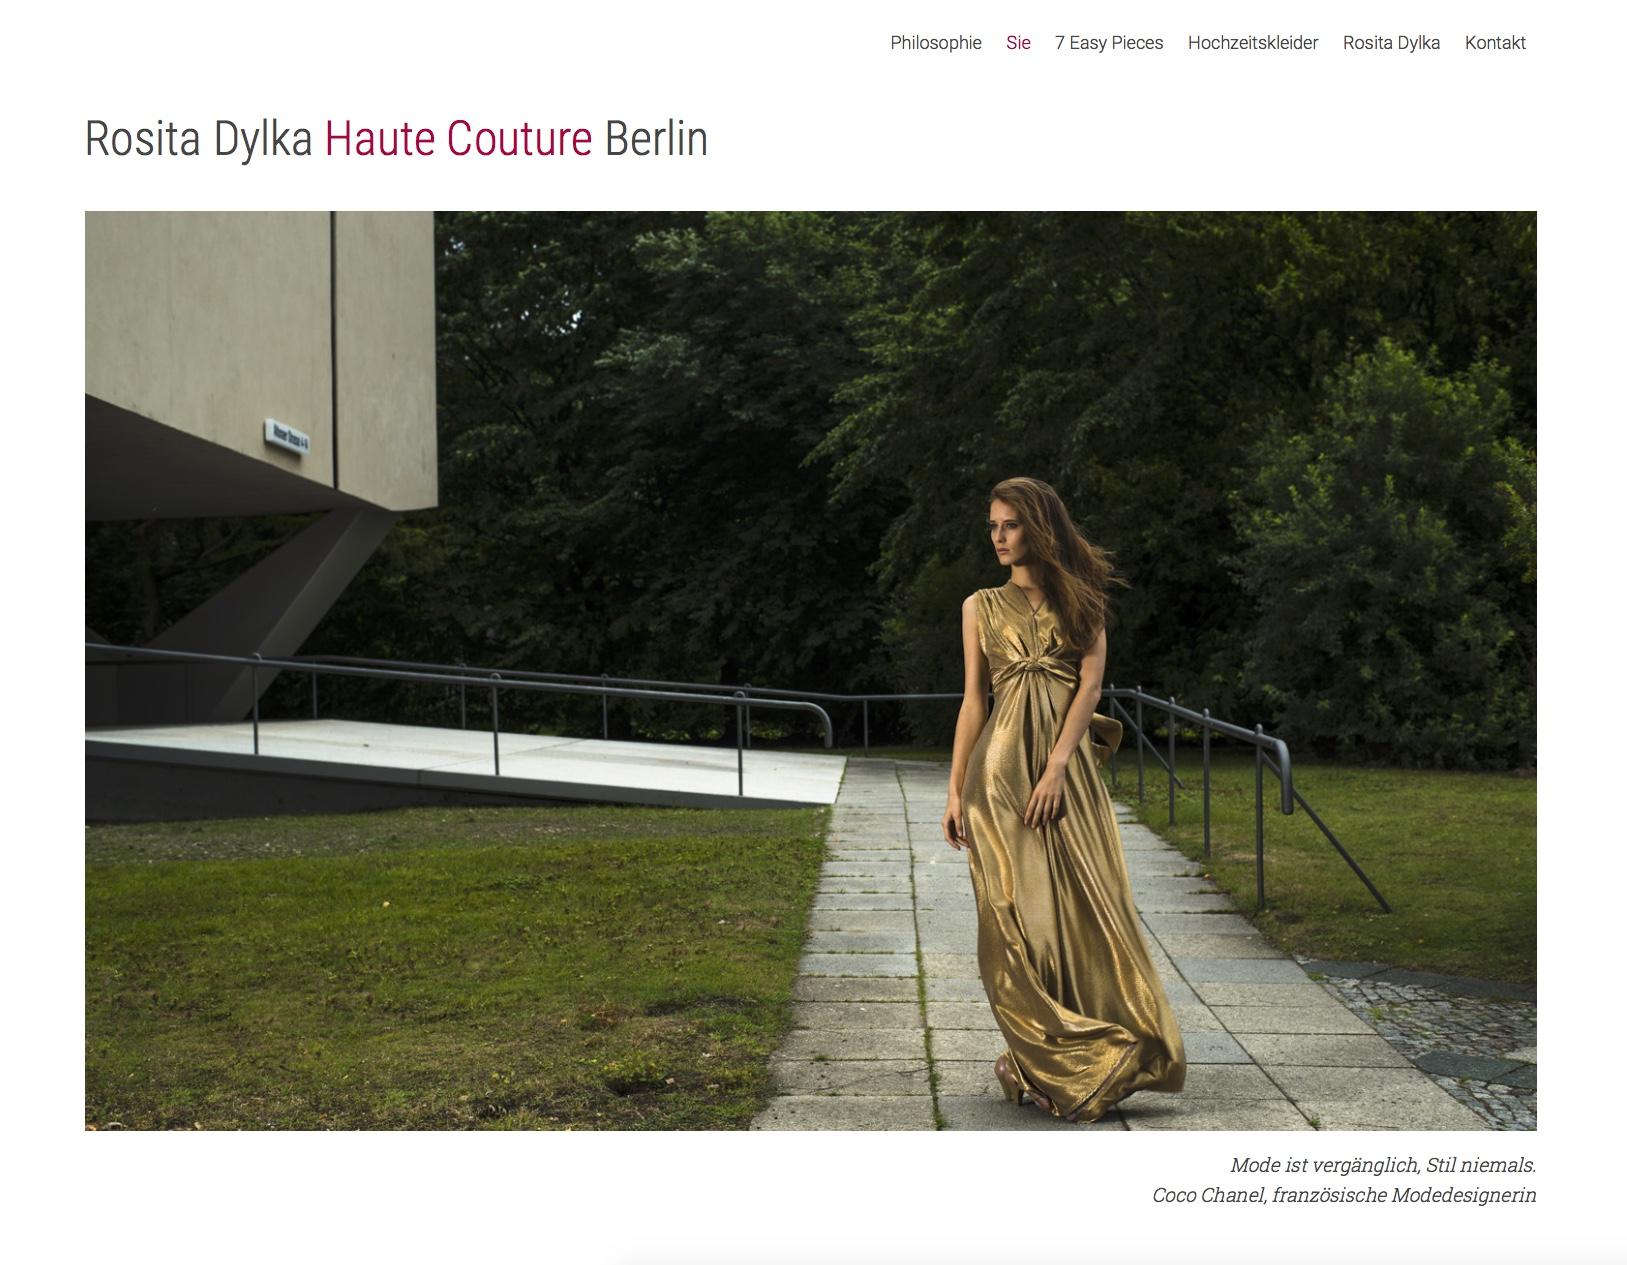 Rosita Dylka